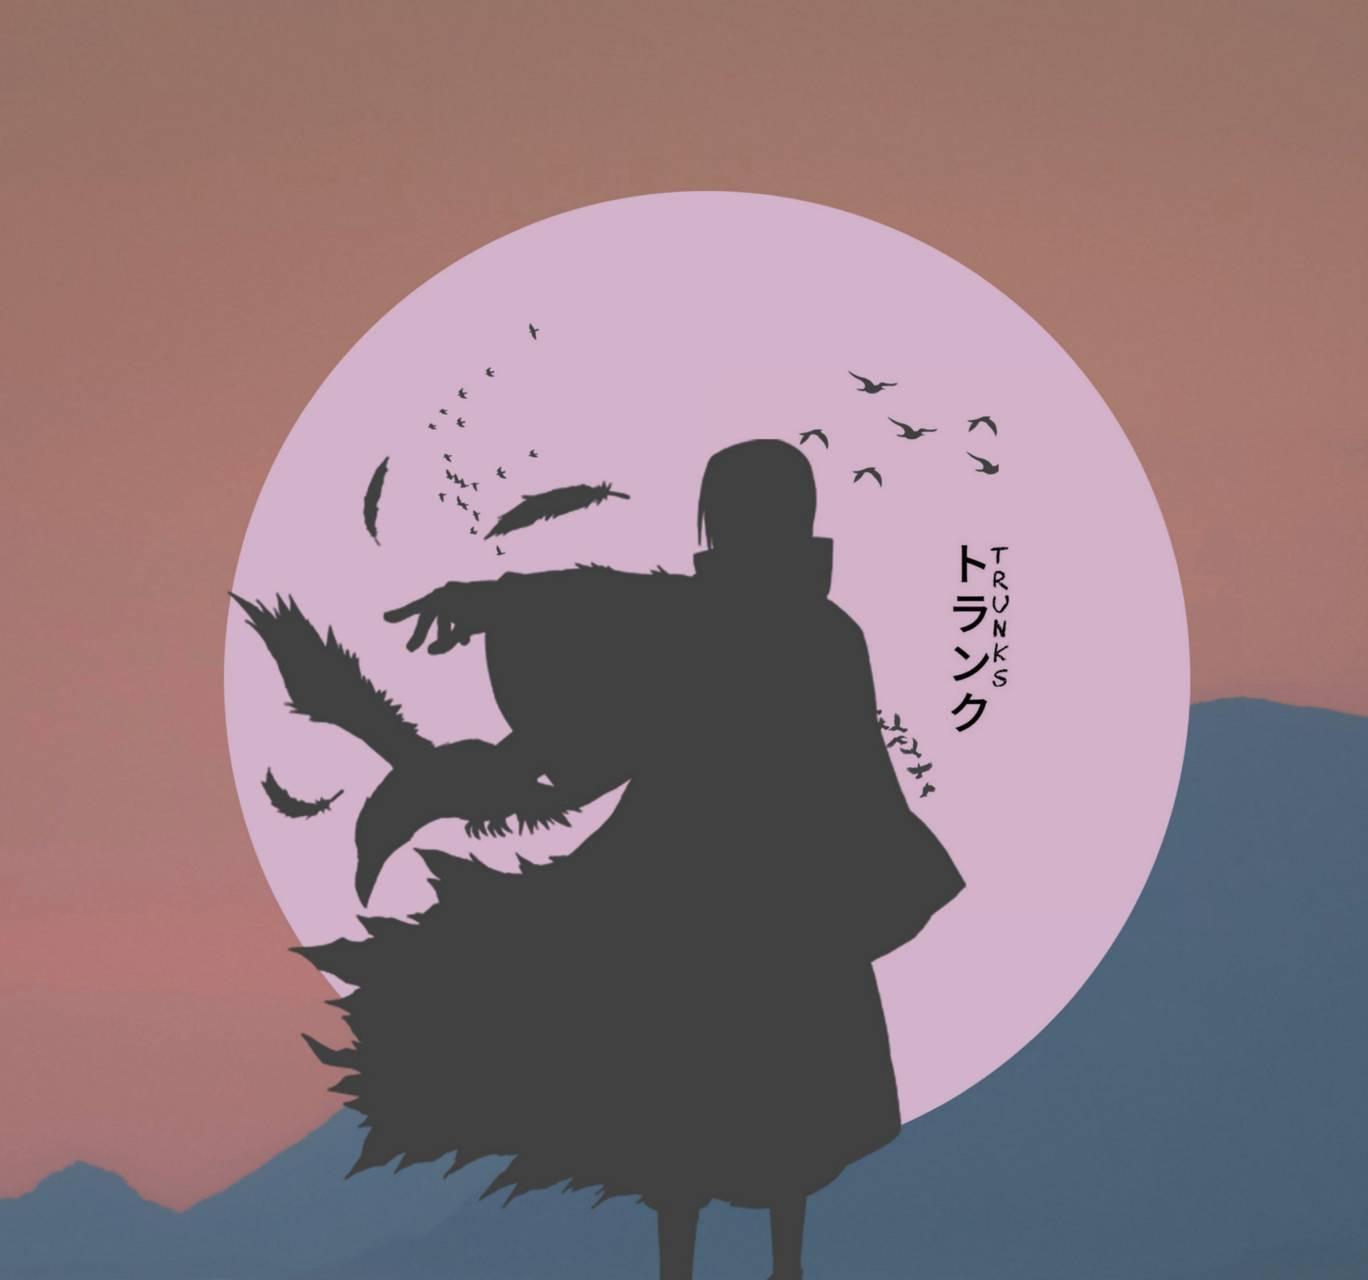 Itachi silhouette